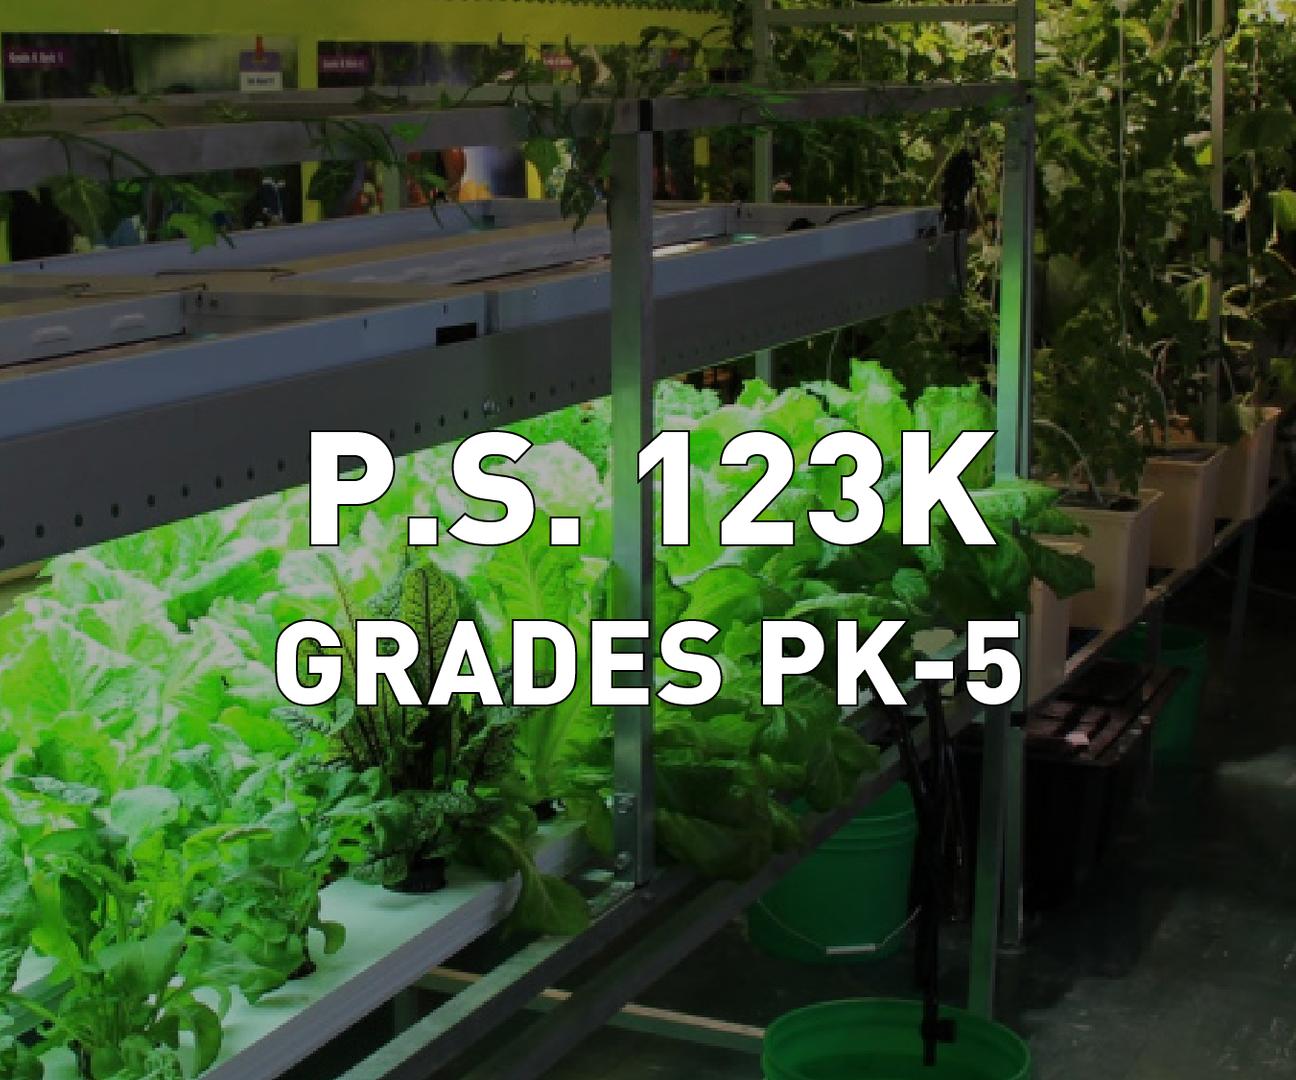 P.S. 123K Grades PK-5